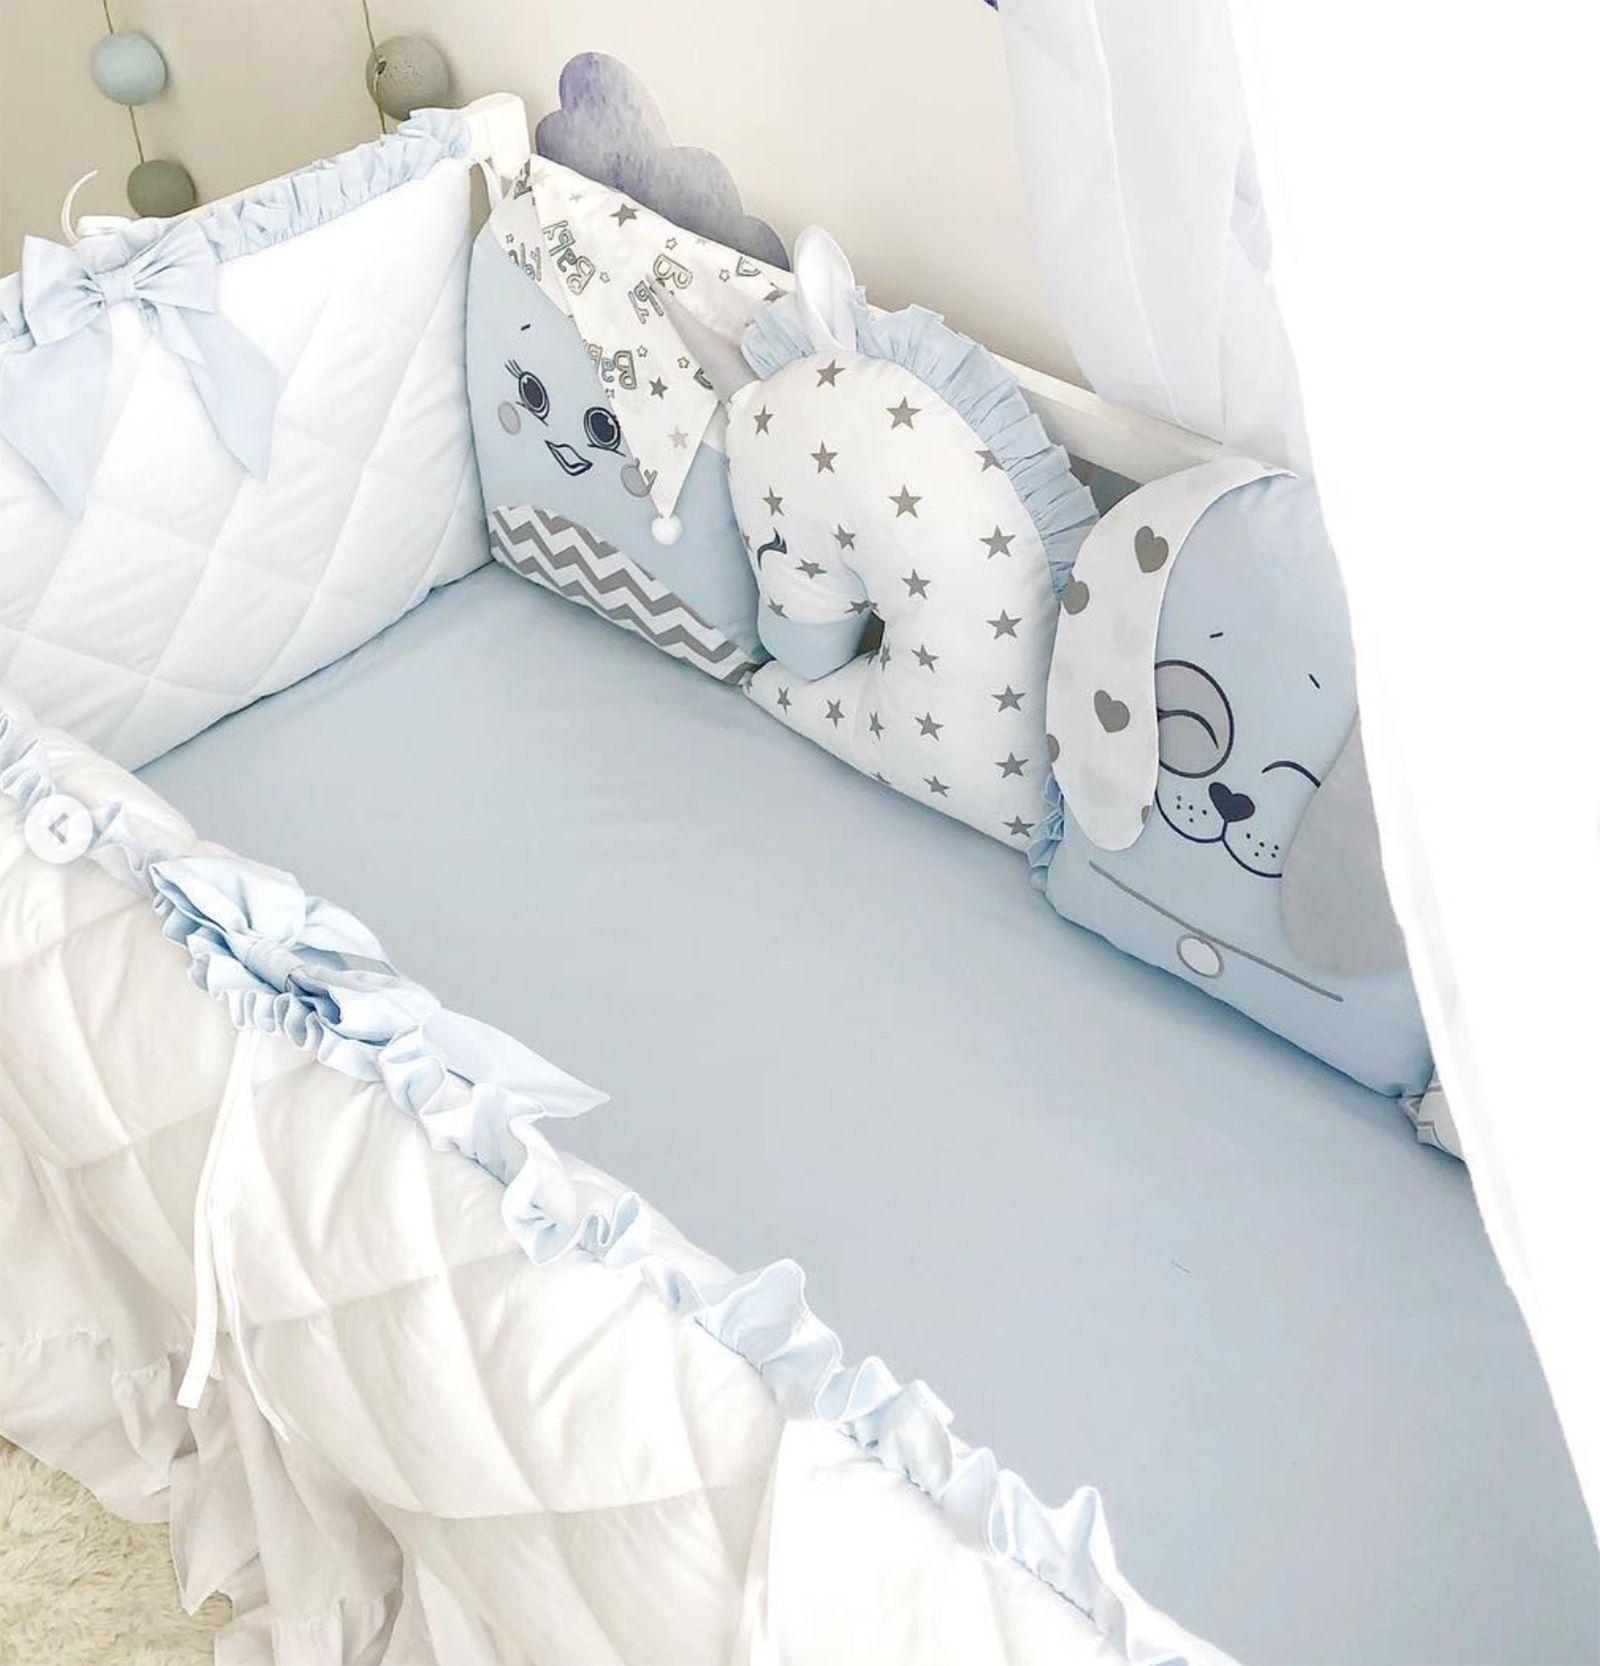 6pc Baby Crib Bedding Set Bumper Cartoon Baby Bedding Rainbow 7